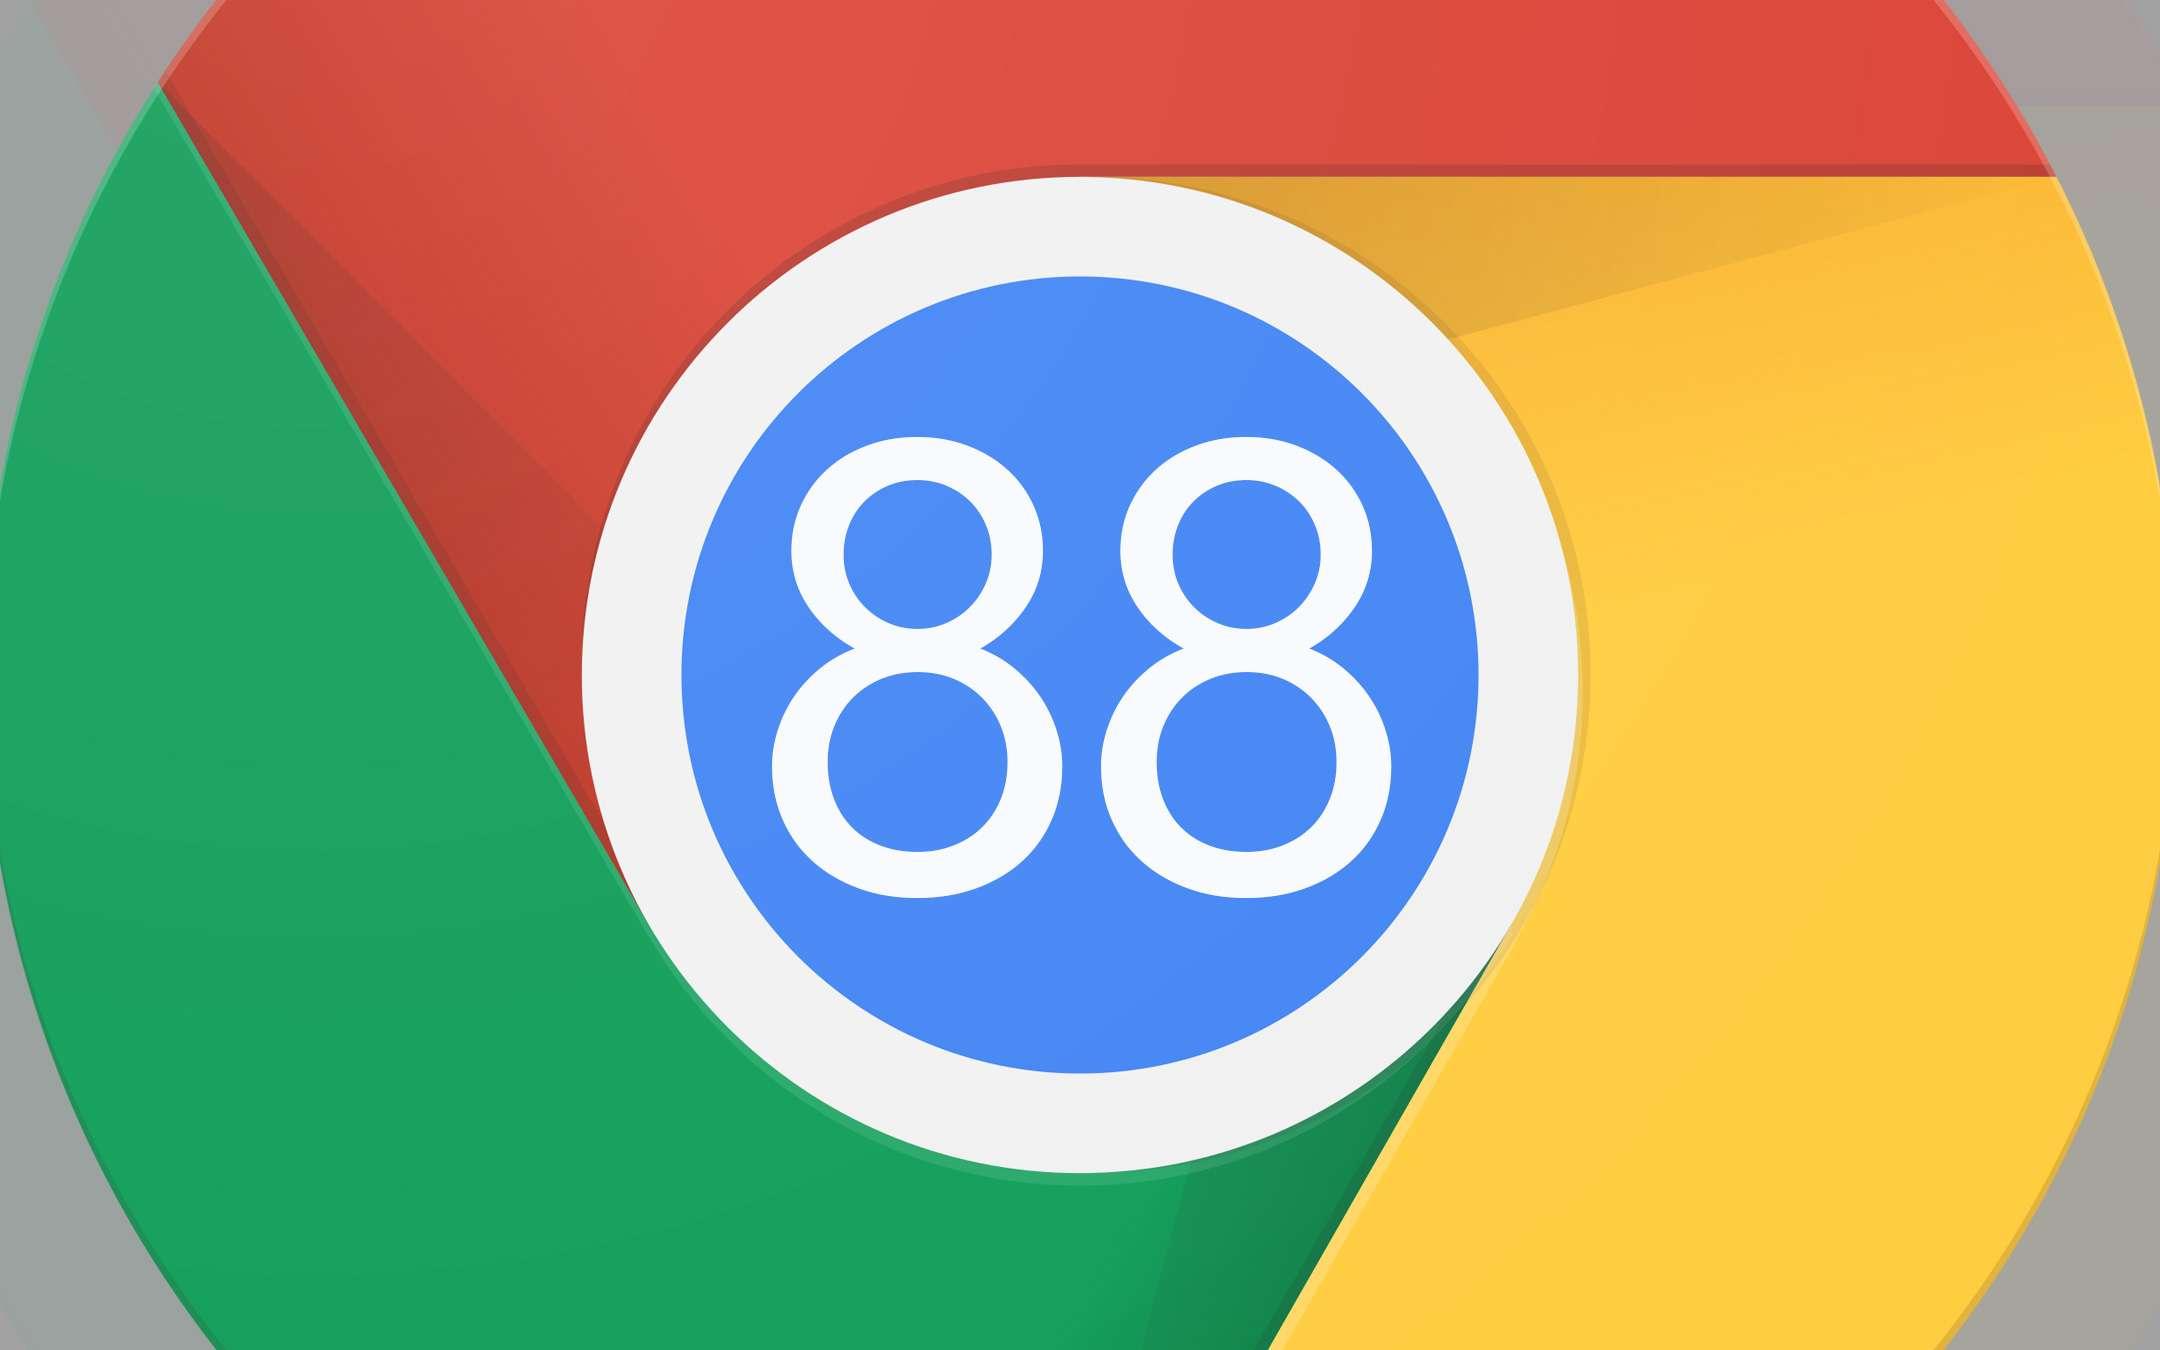 Chrome 88: new update fixes nine vulnerabilities